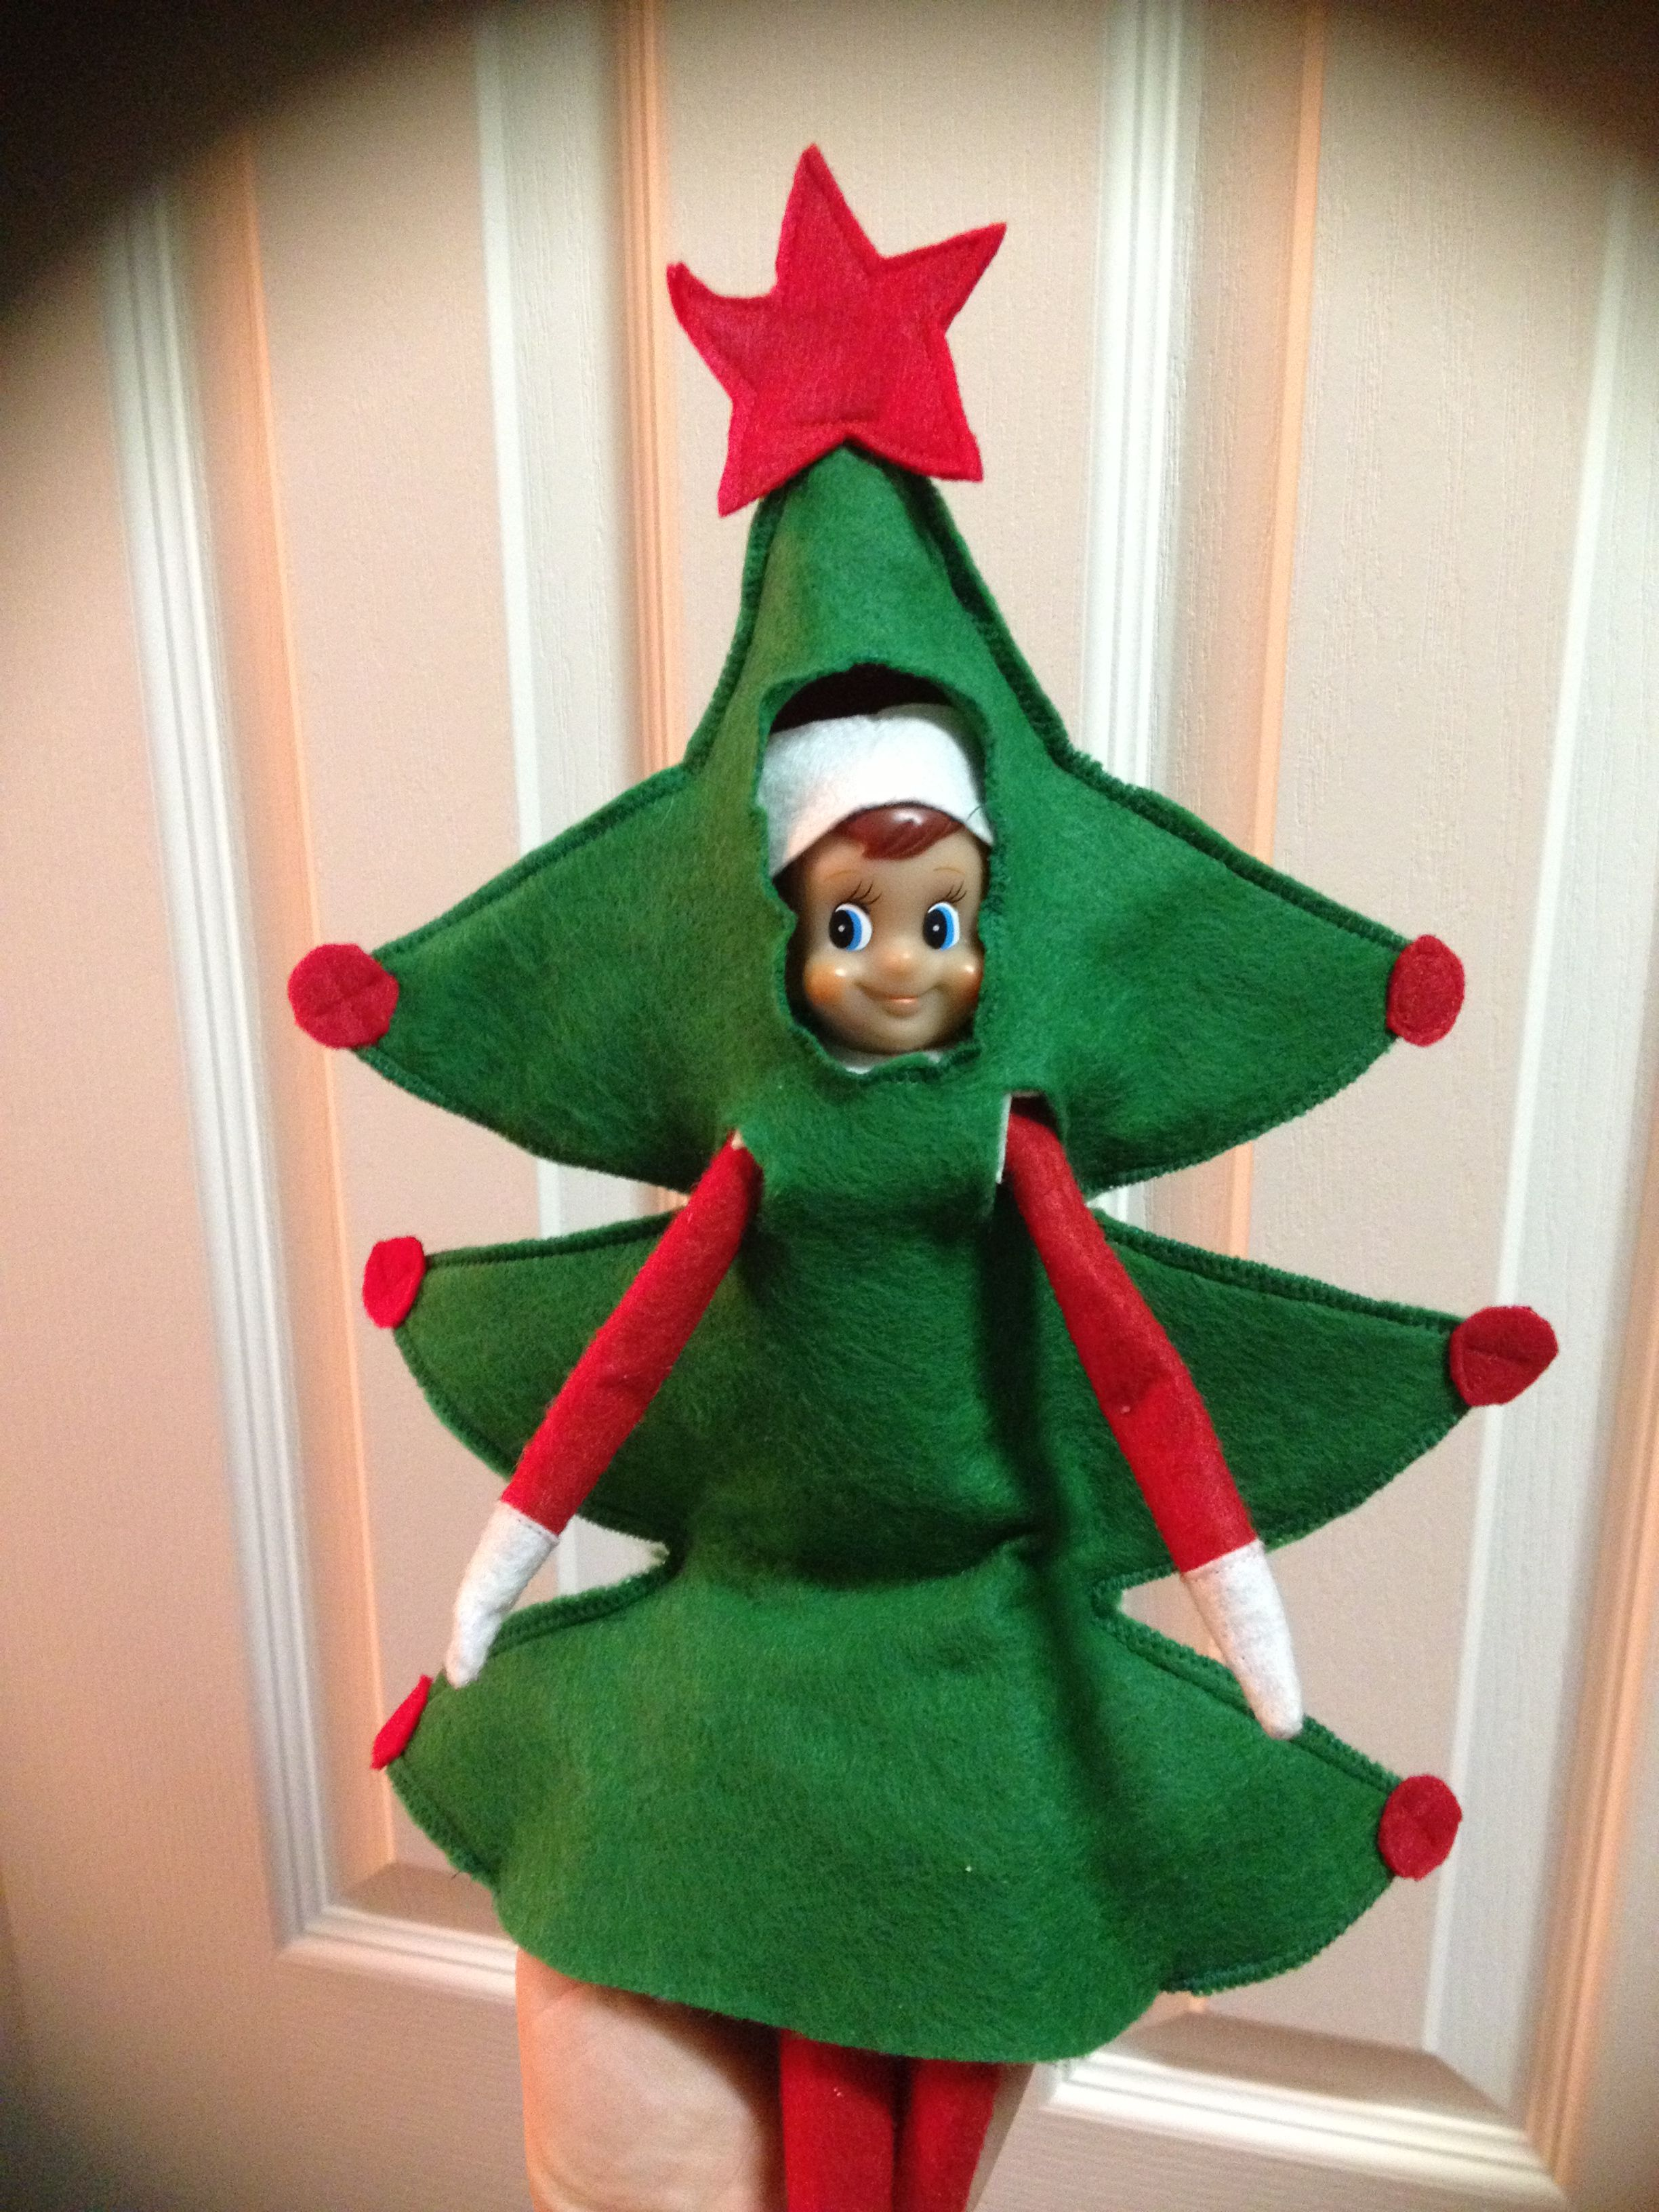 Herbie Elf Shelf Christmas Tree